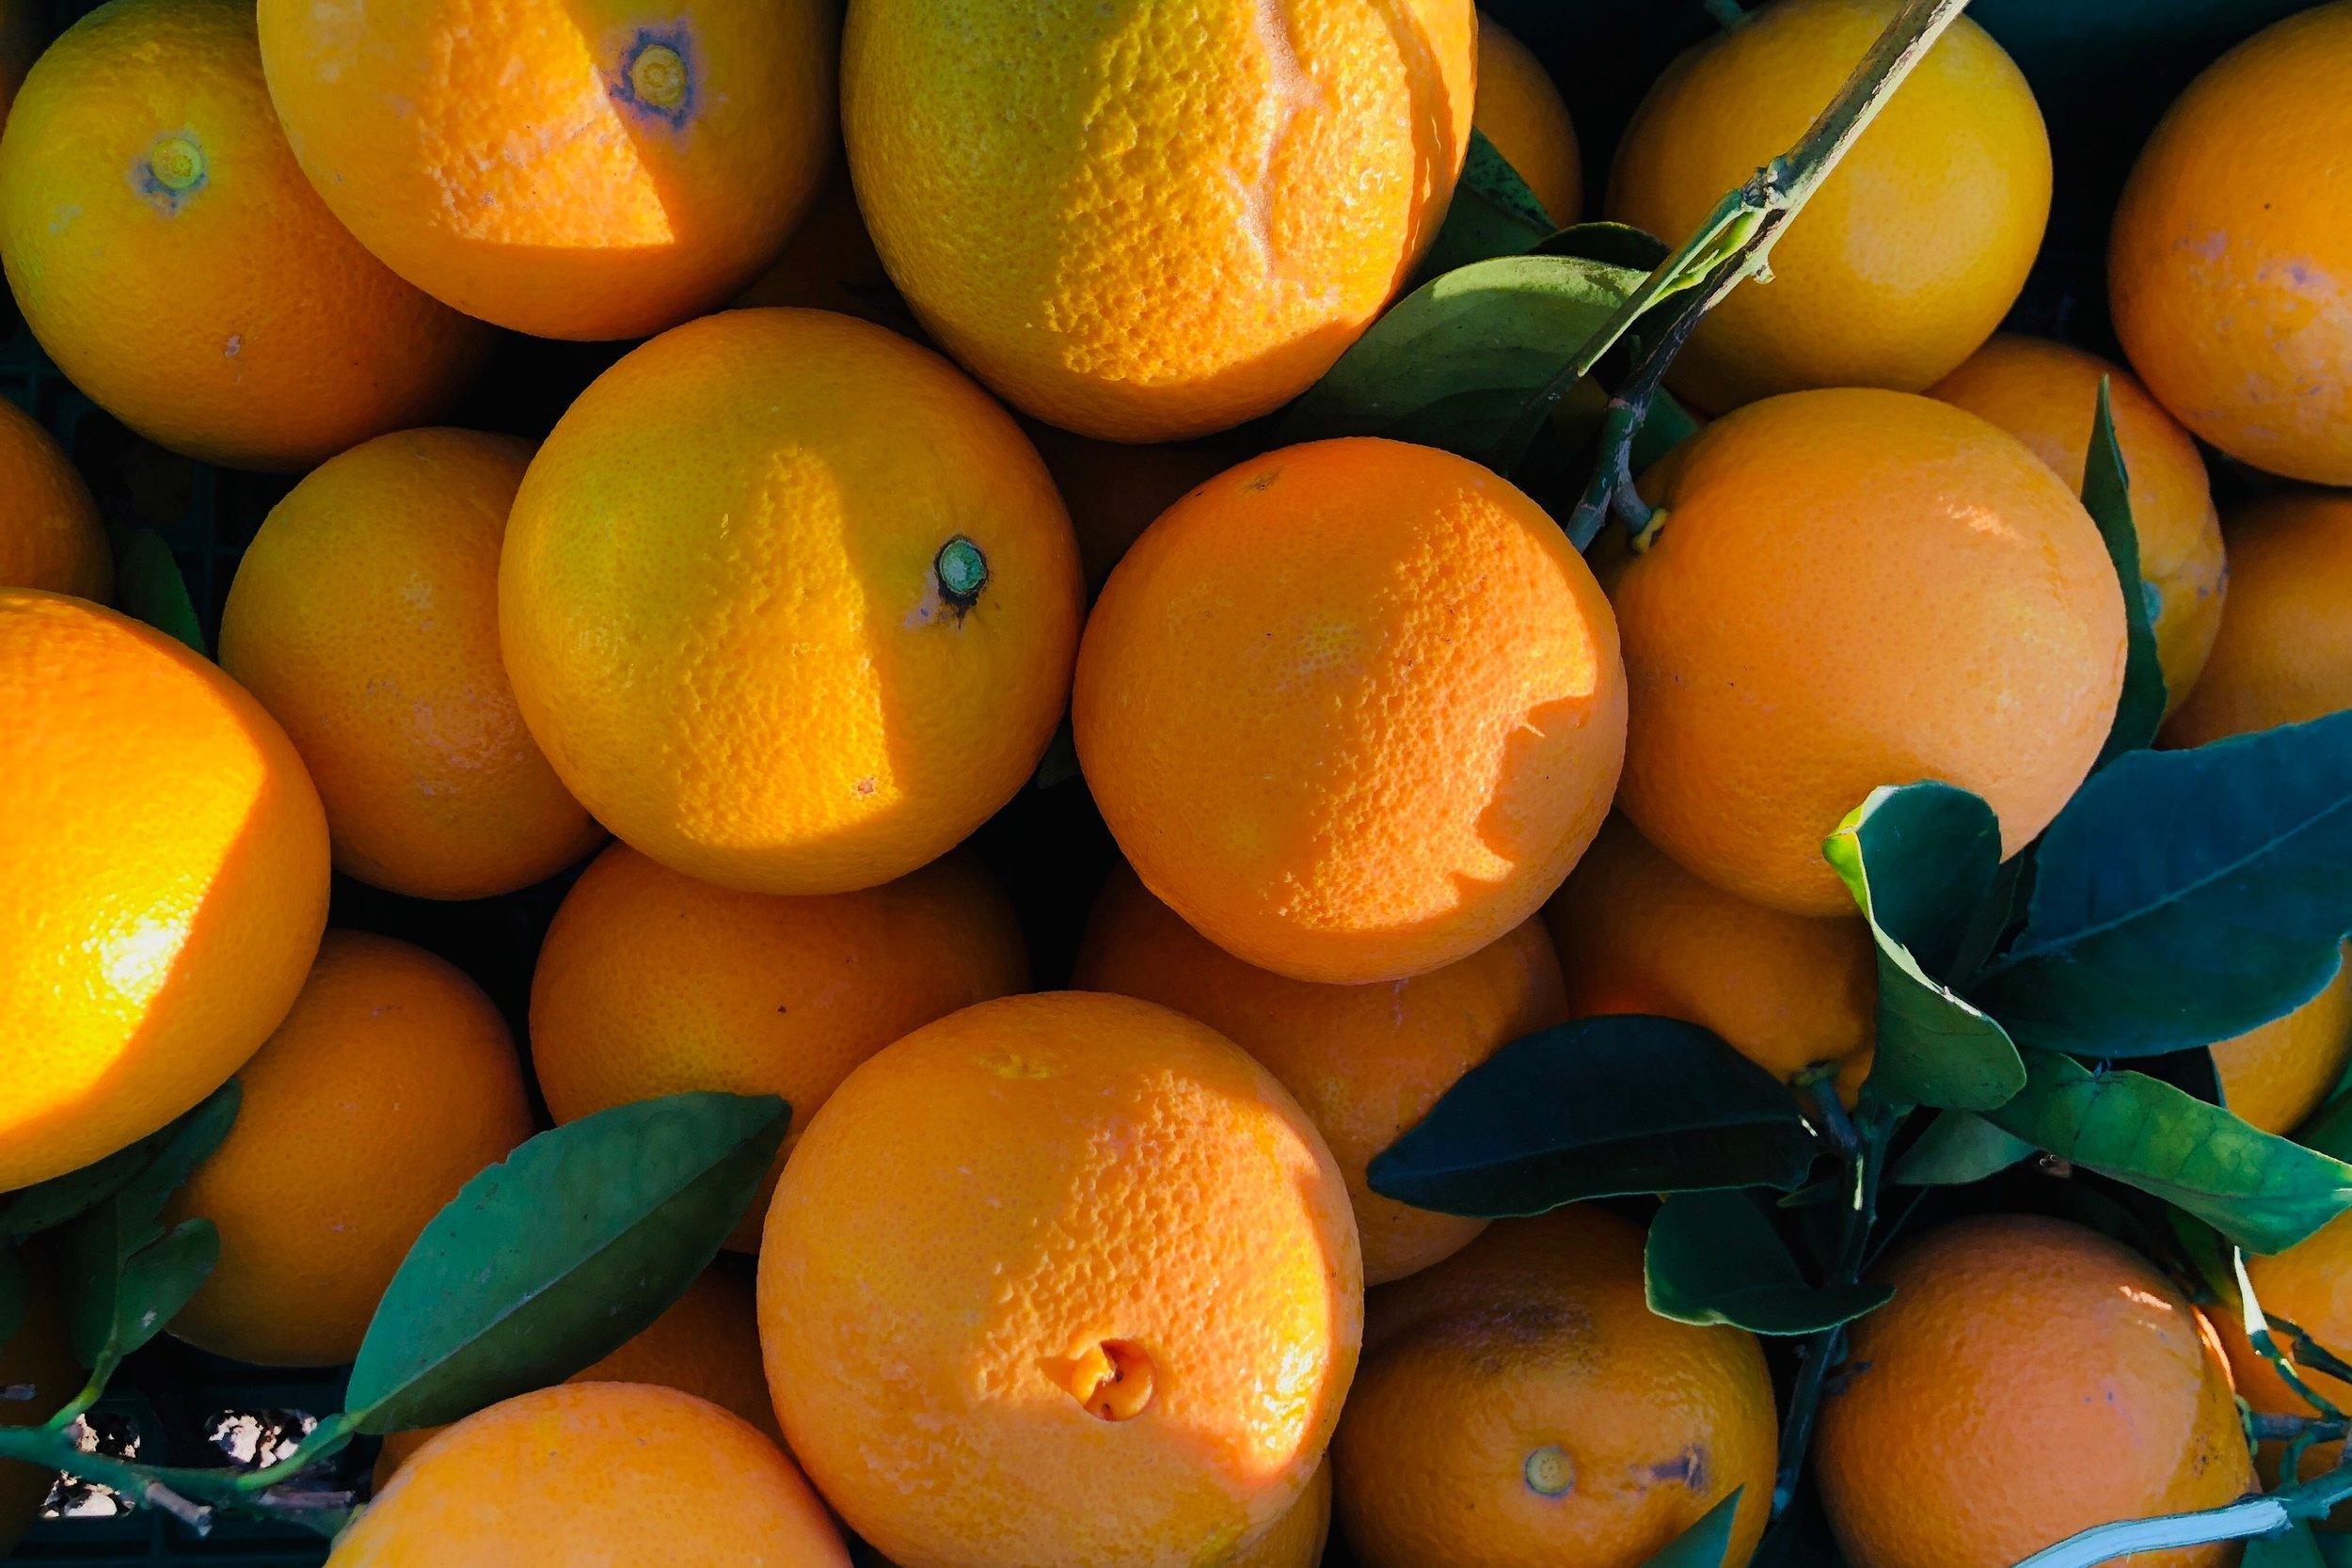 edr_oranges.jpeg